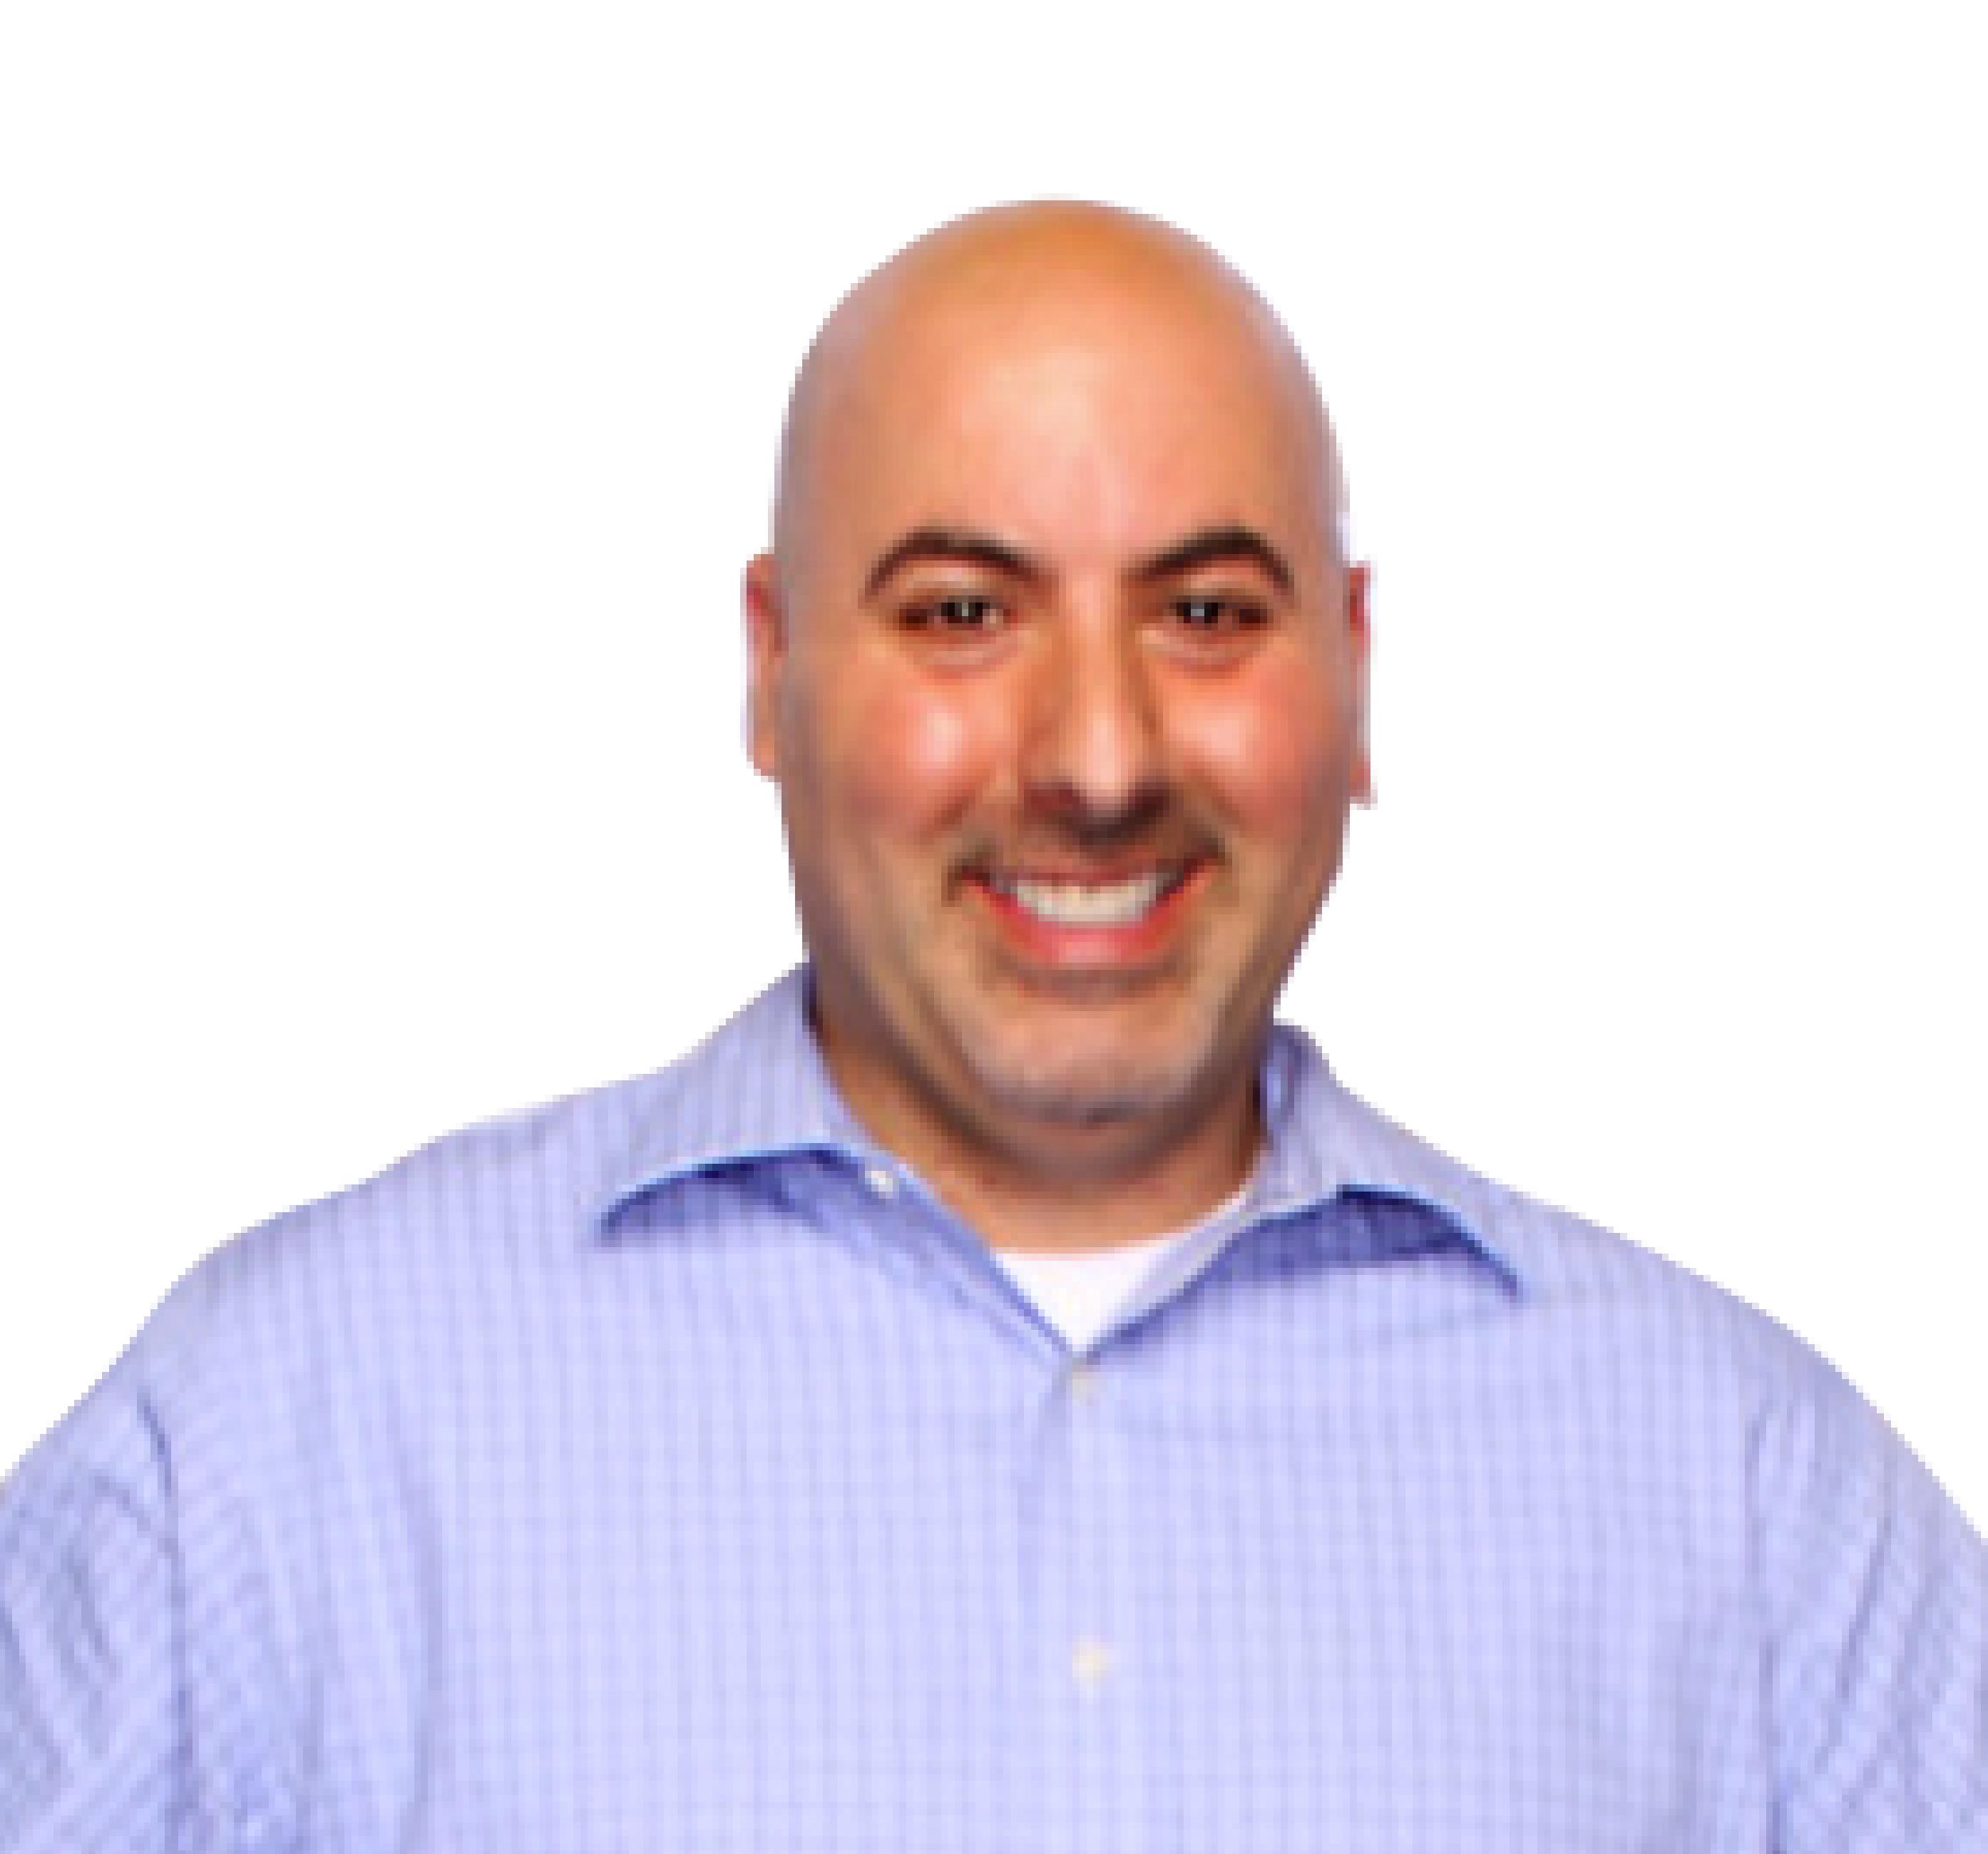 David Mitroff Oakland Business Expert